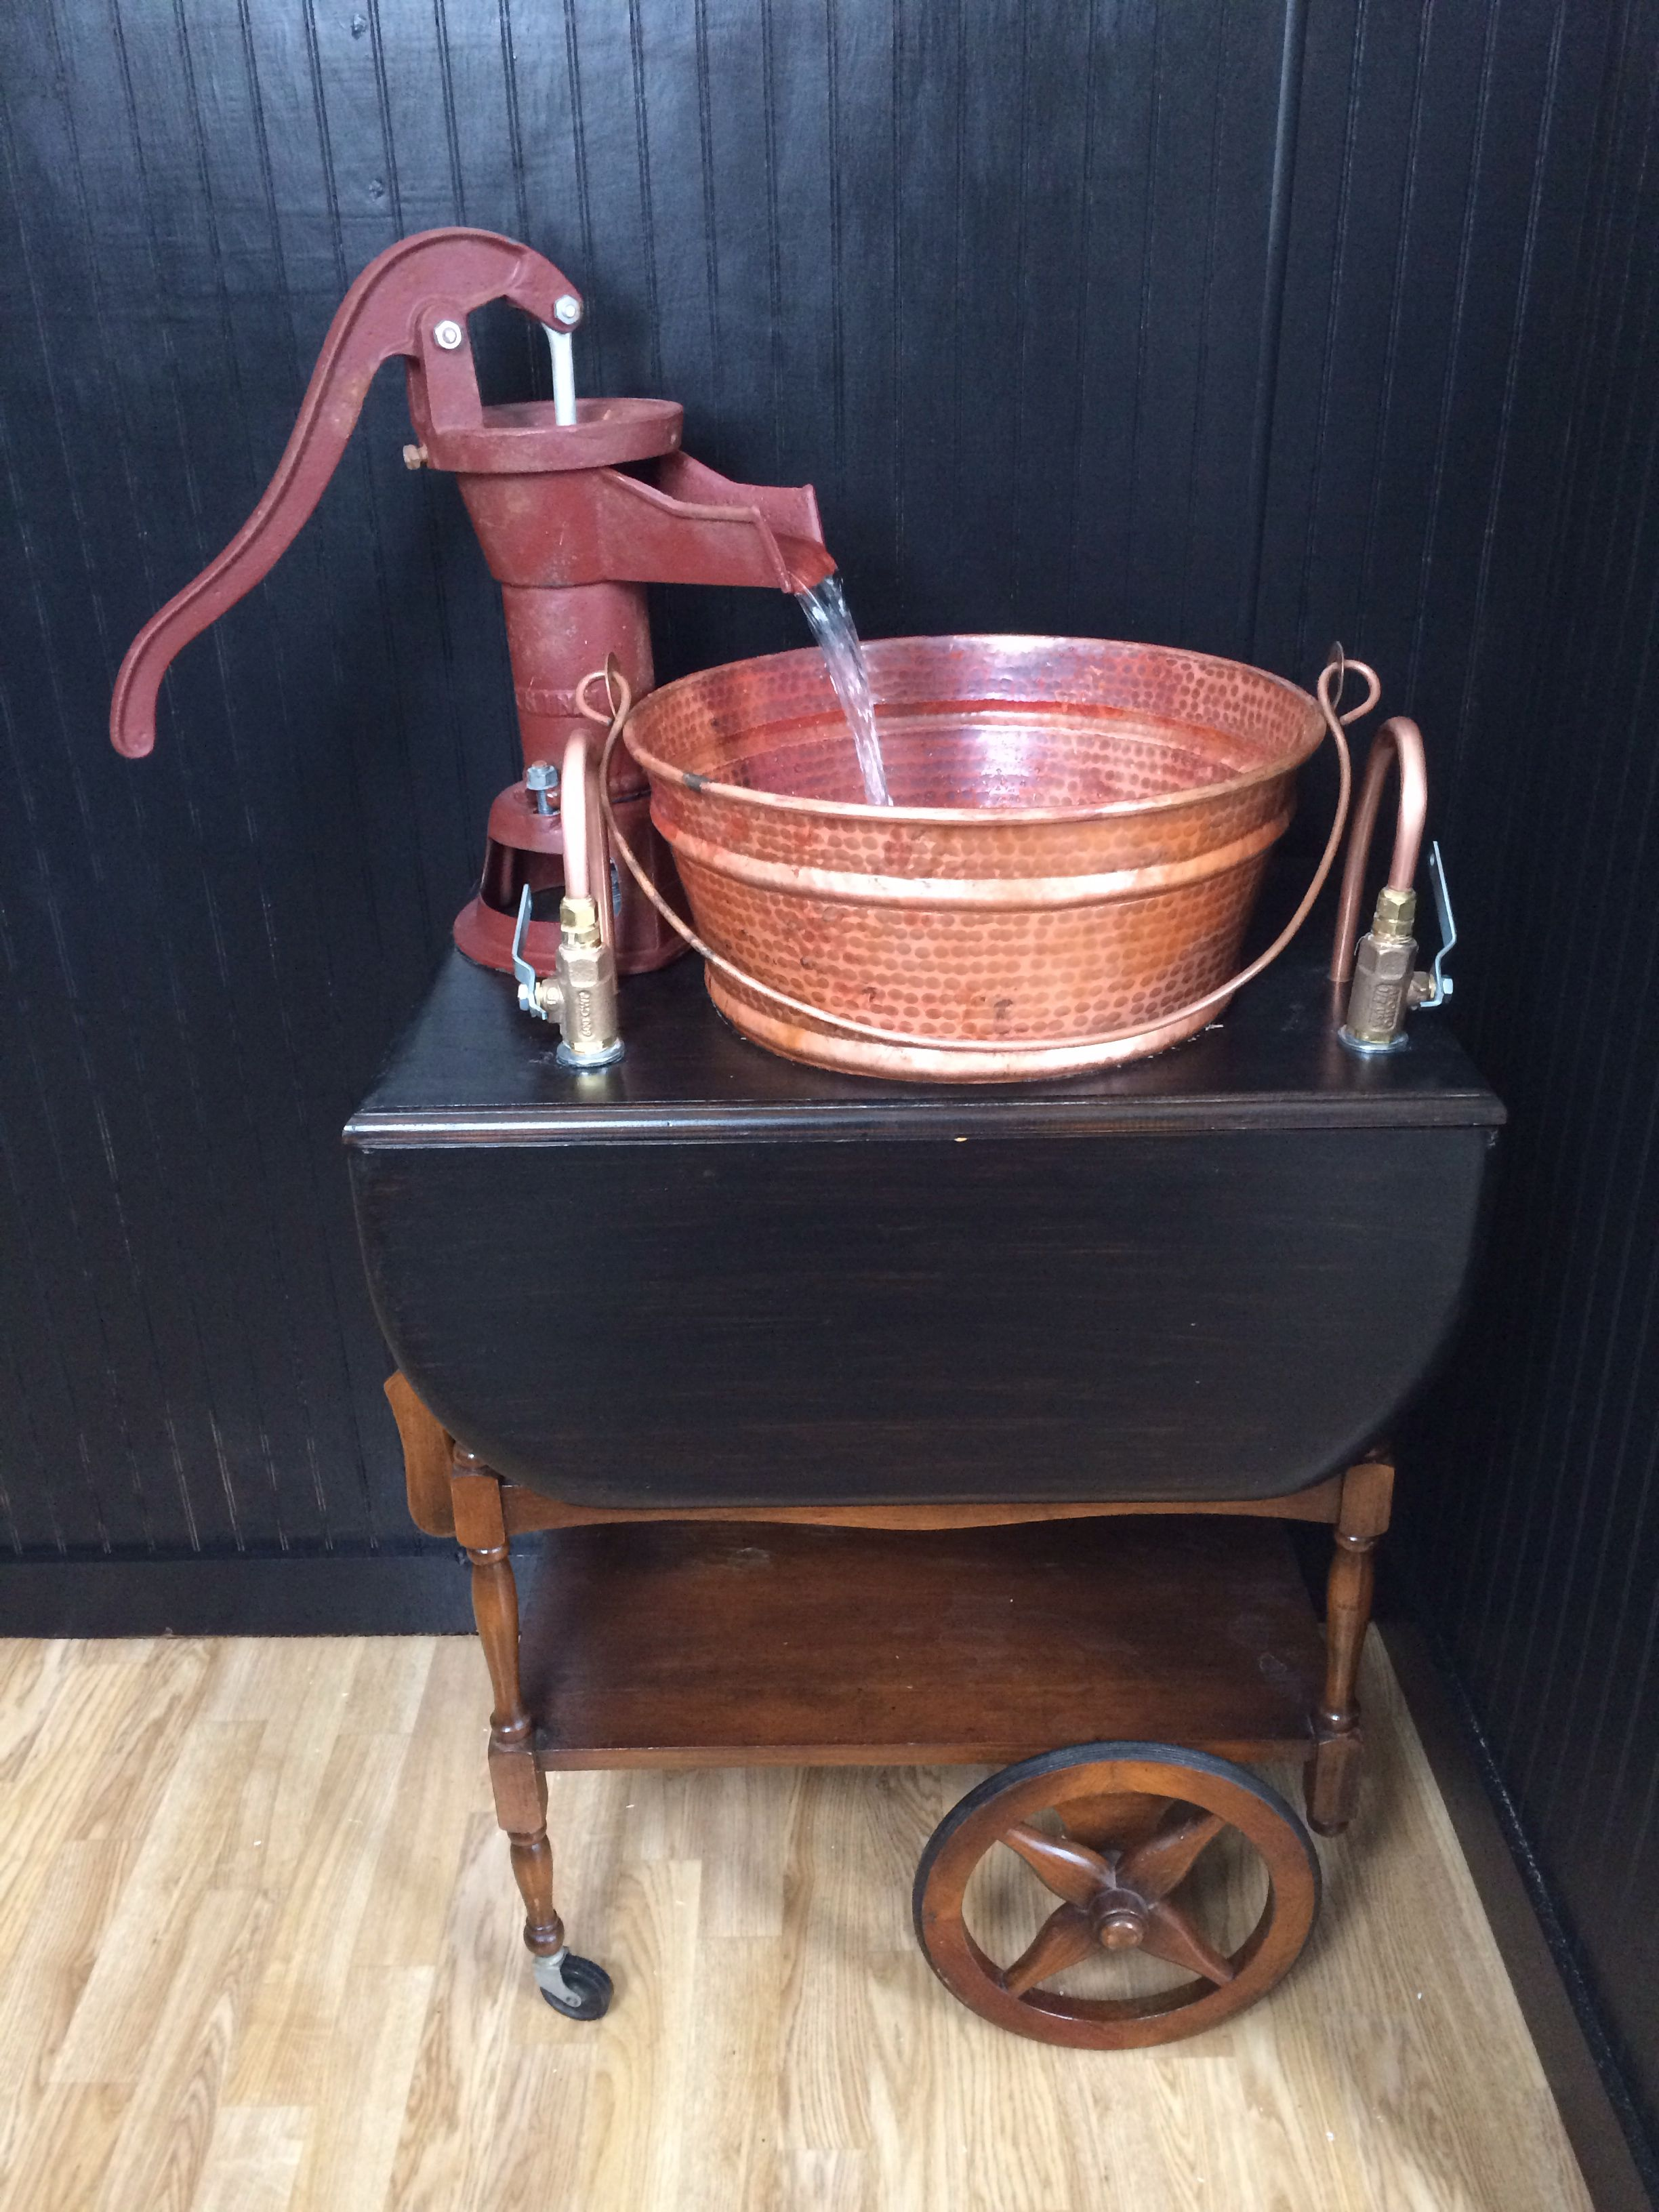 My Rustic Sink Hand Water Pump Copper Tubing Brass Valves An